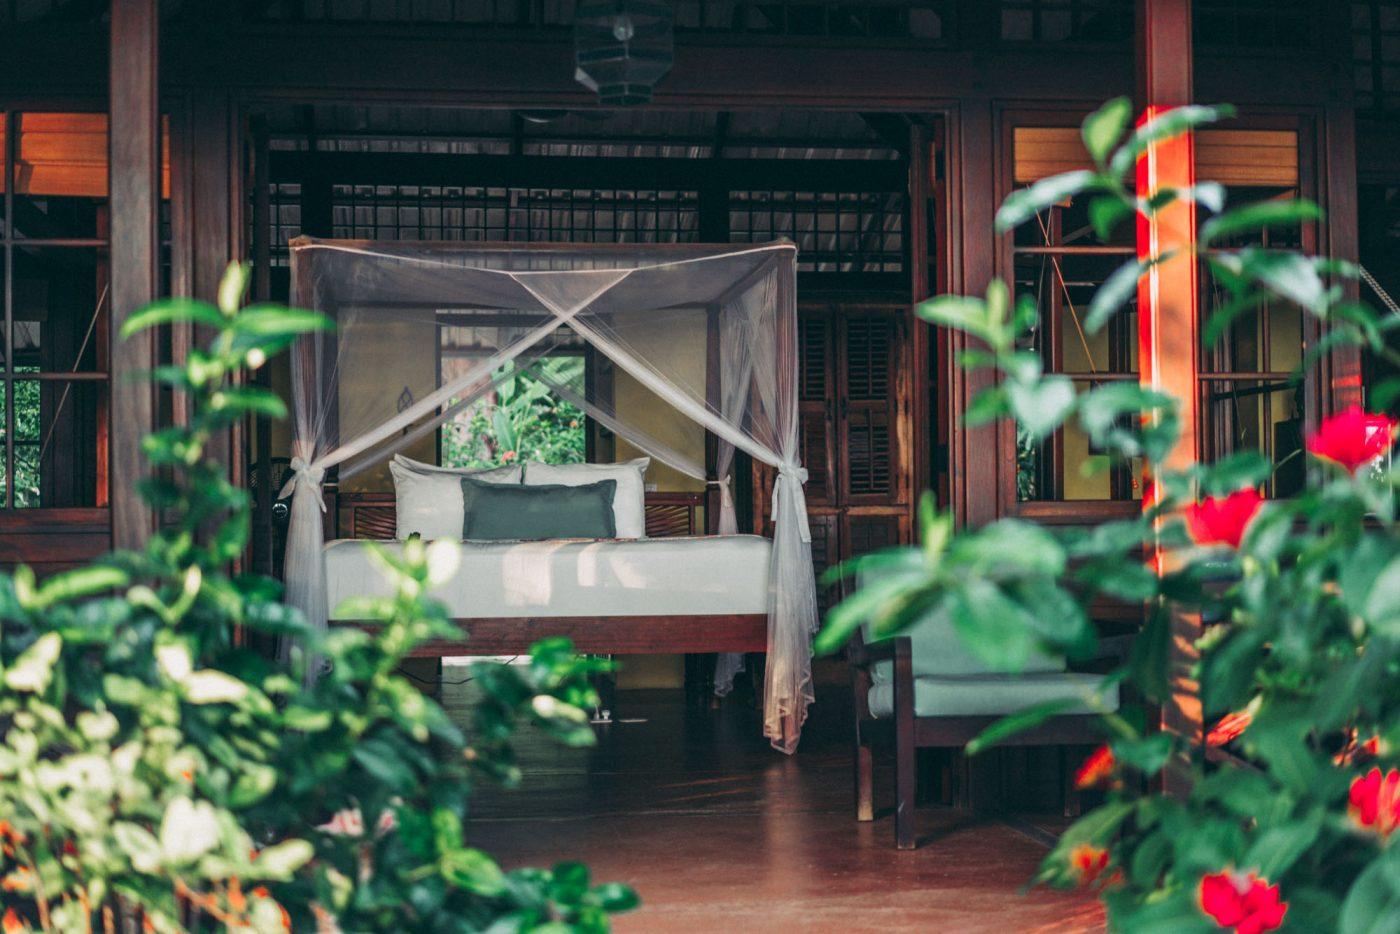 hotels in santa teresa Costa Rica: Our private casita at Latitude 10.